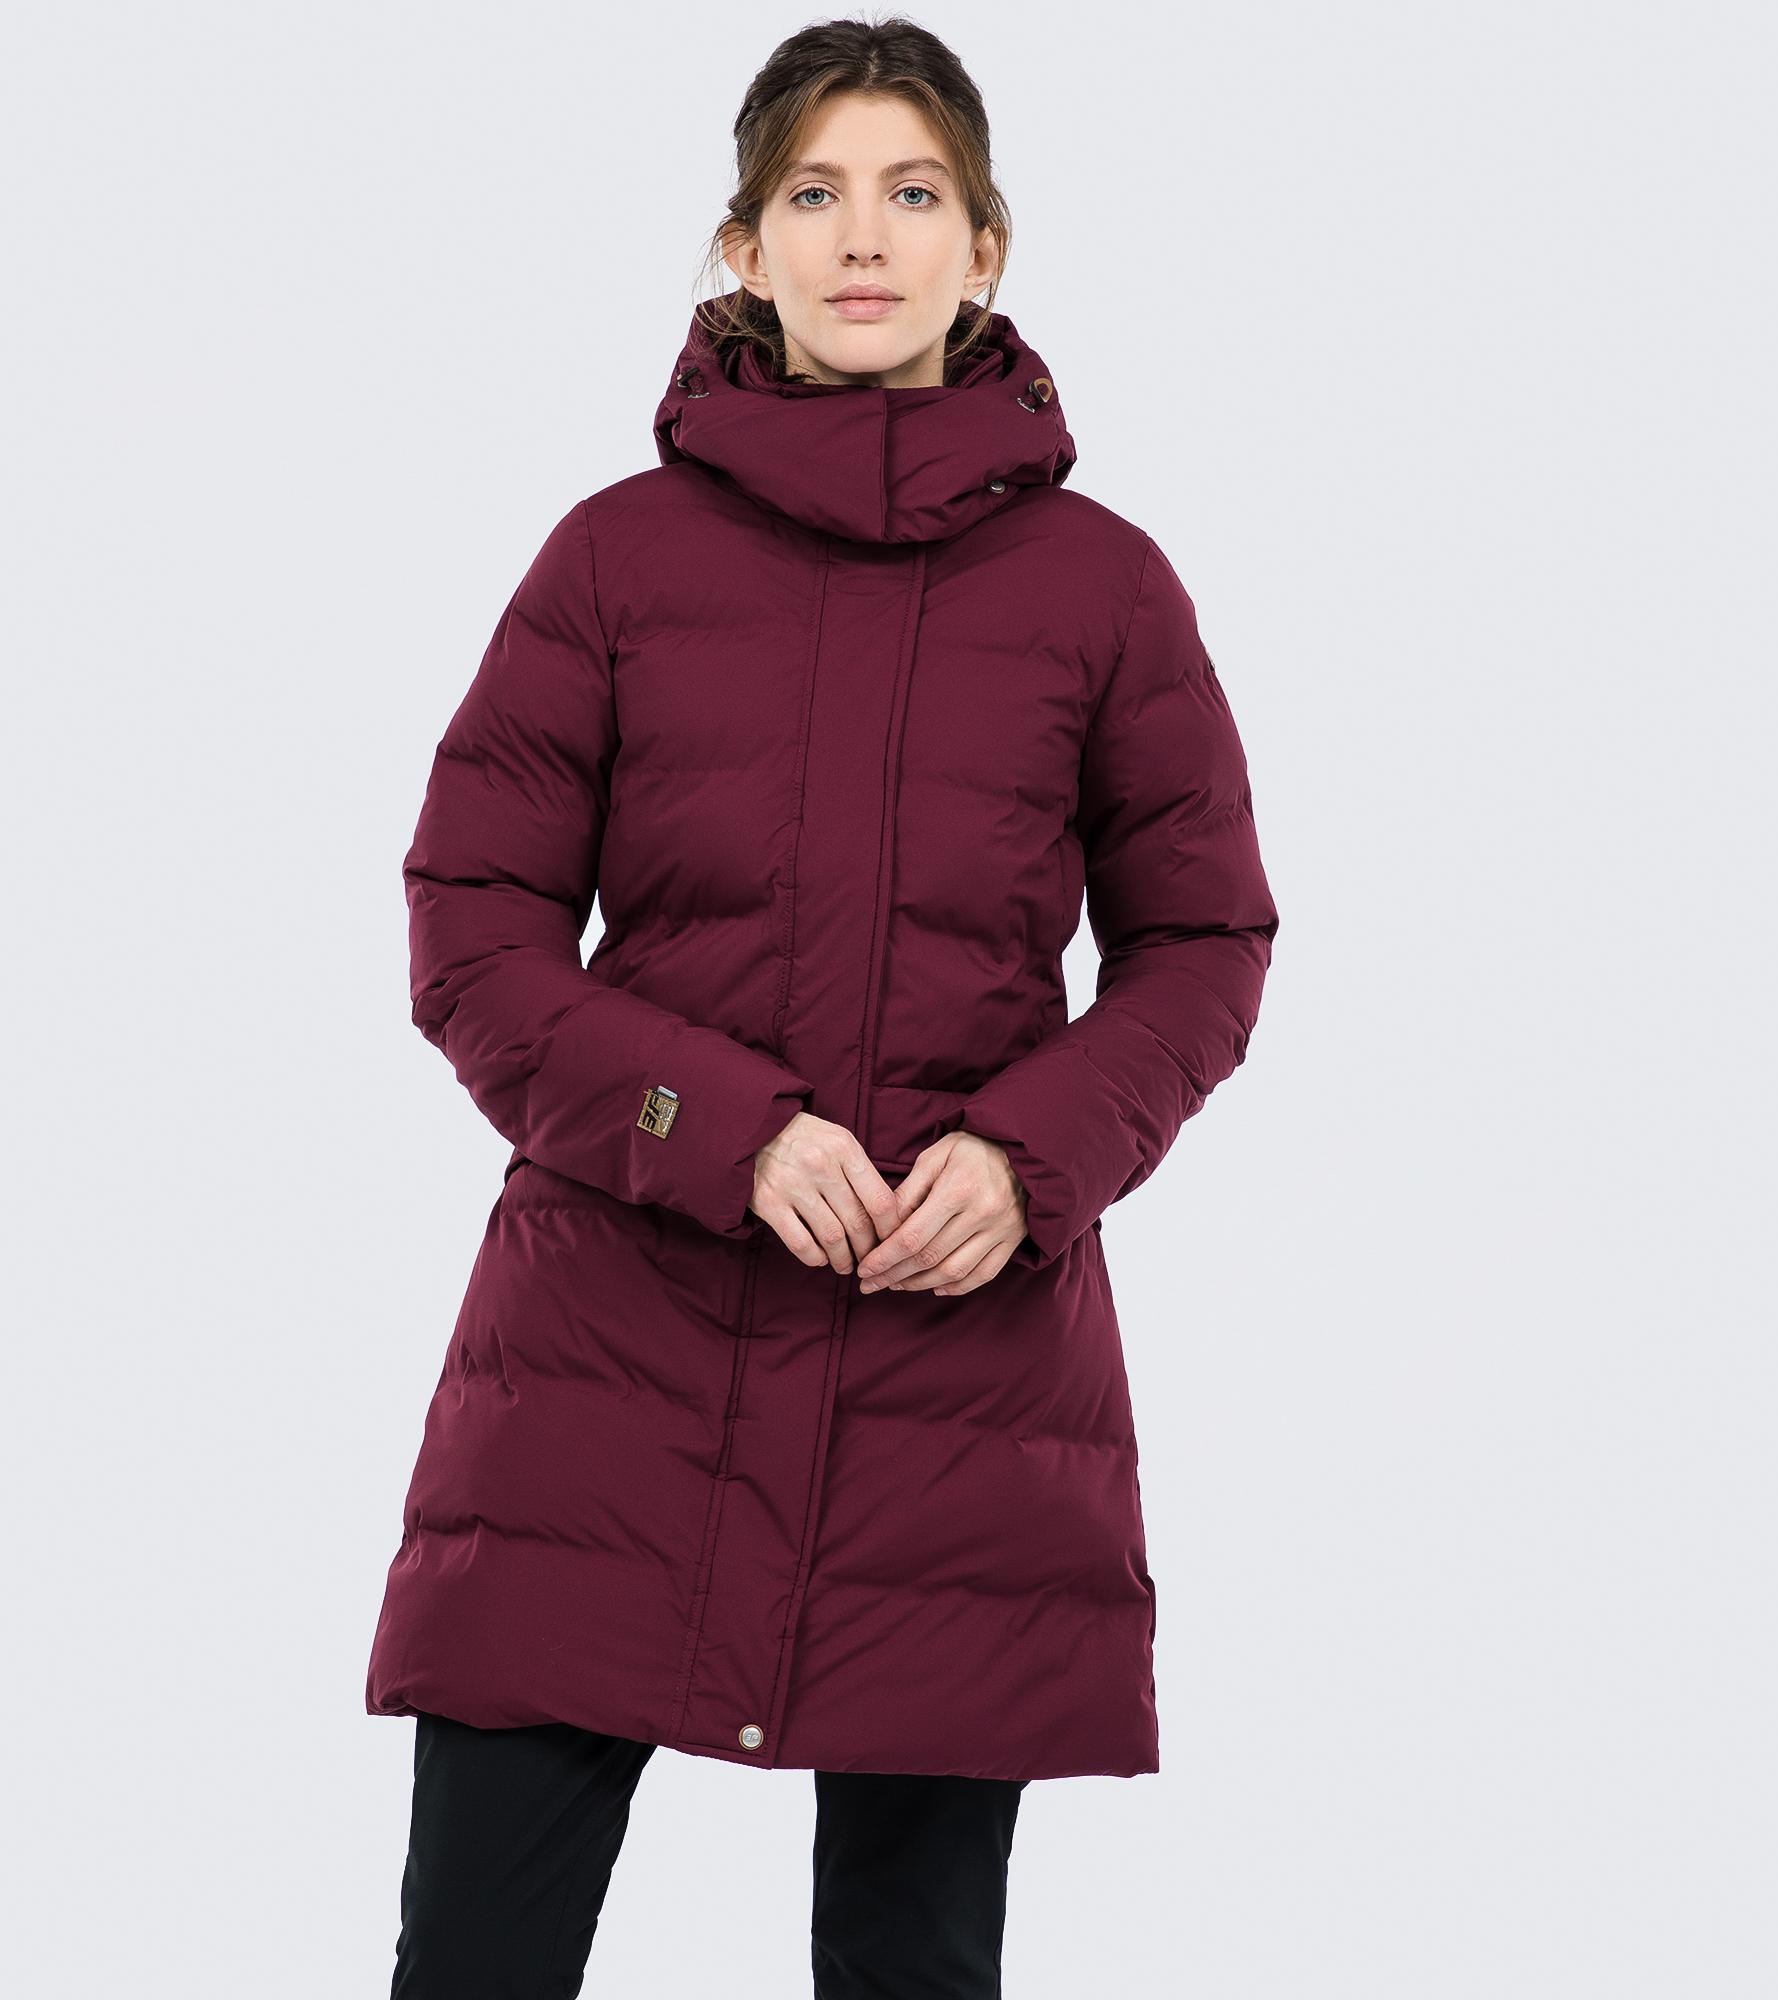 IcePeak Куртка утепленная женская IcePeak Anoka, размер 52